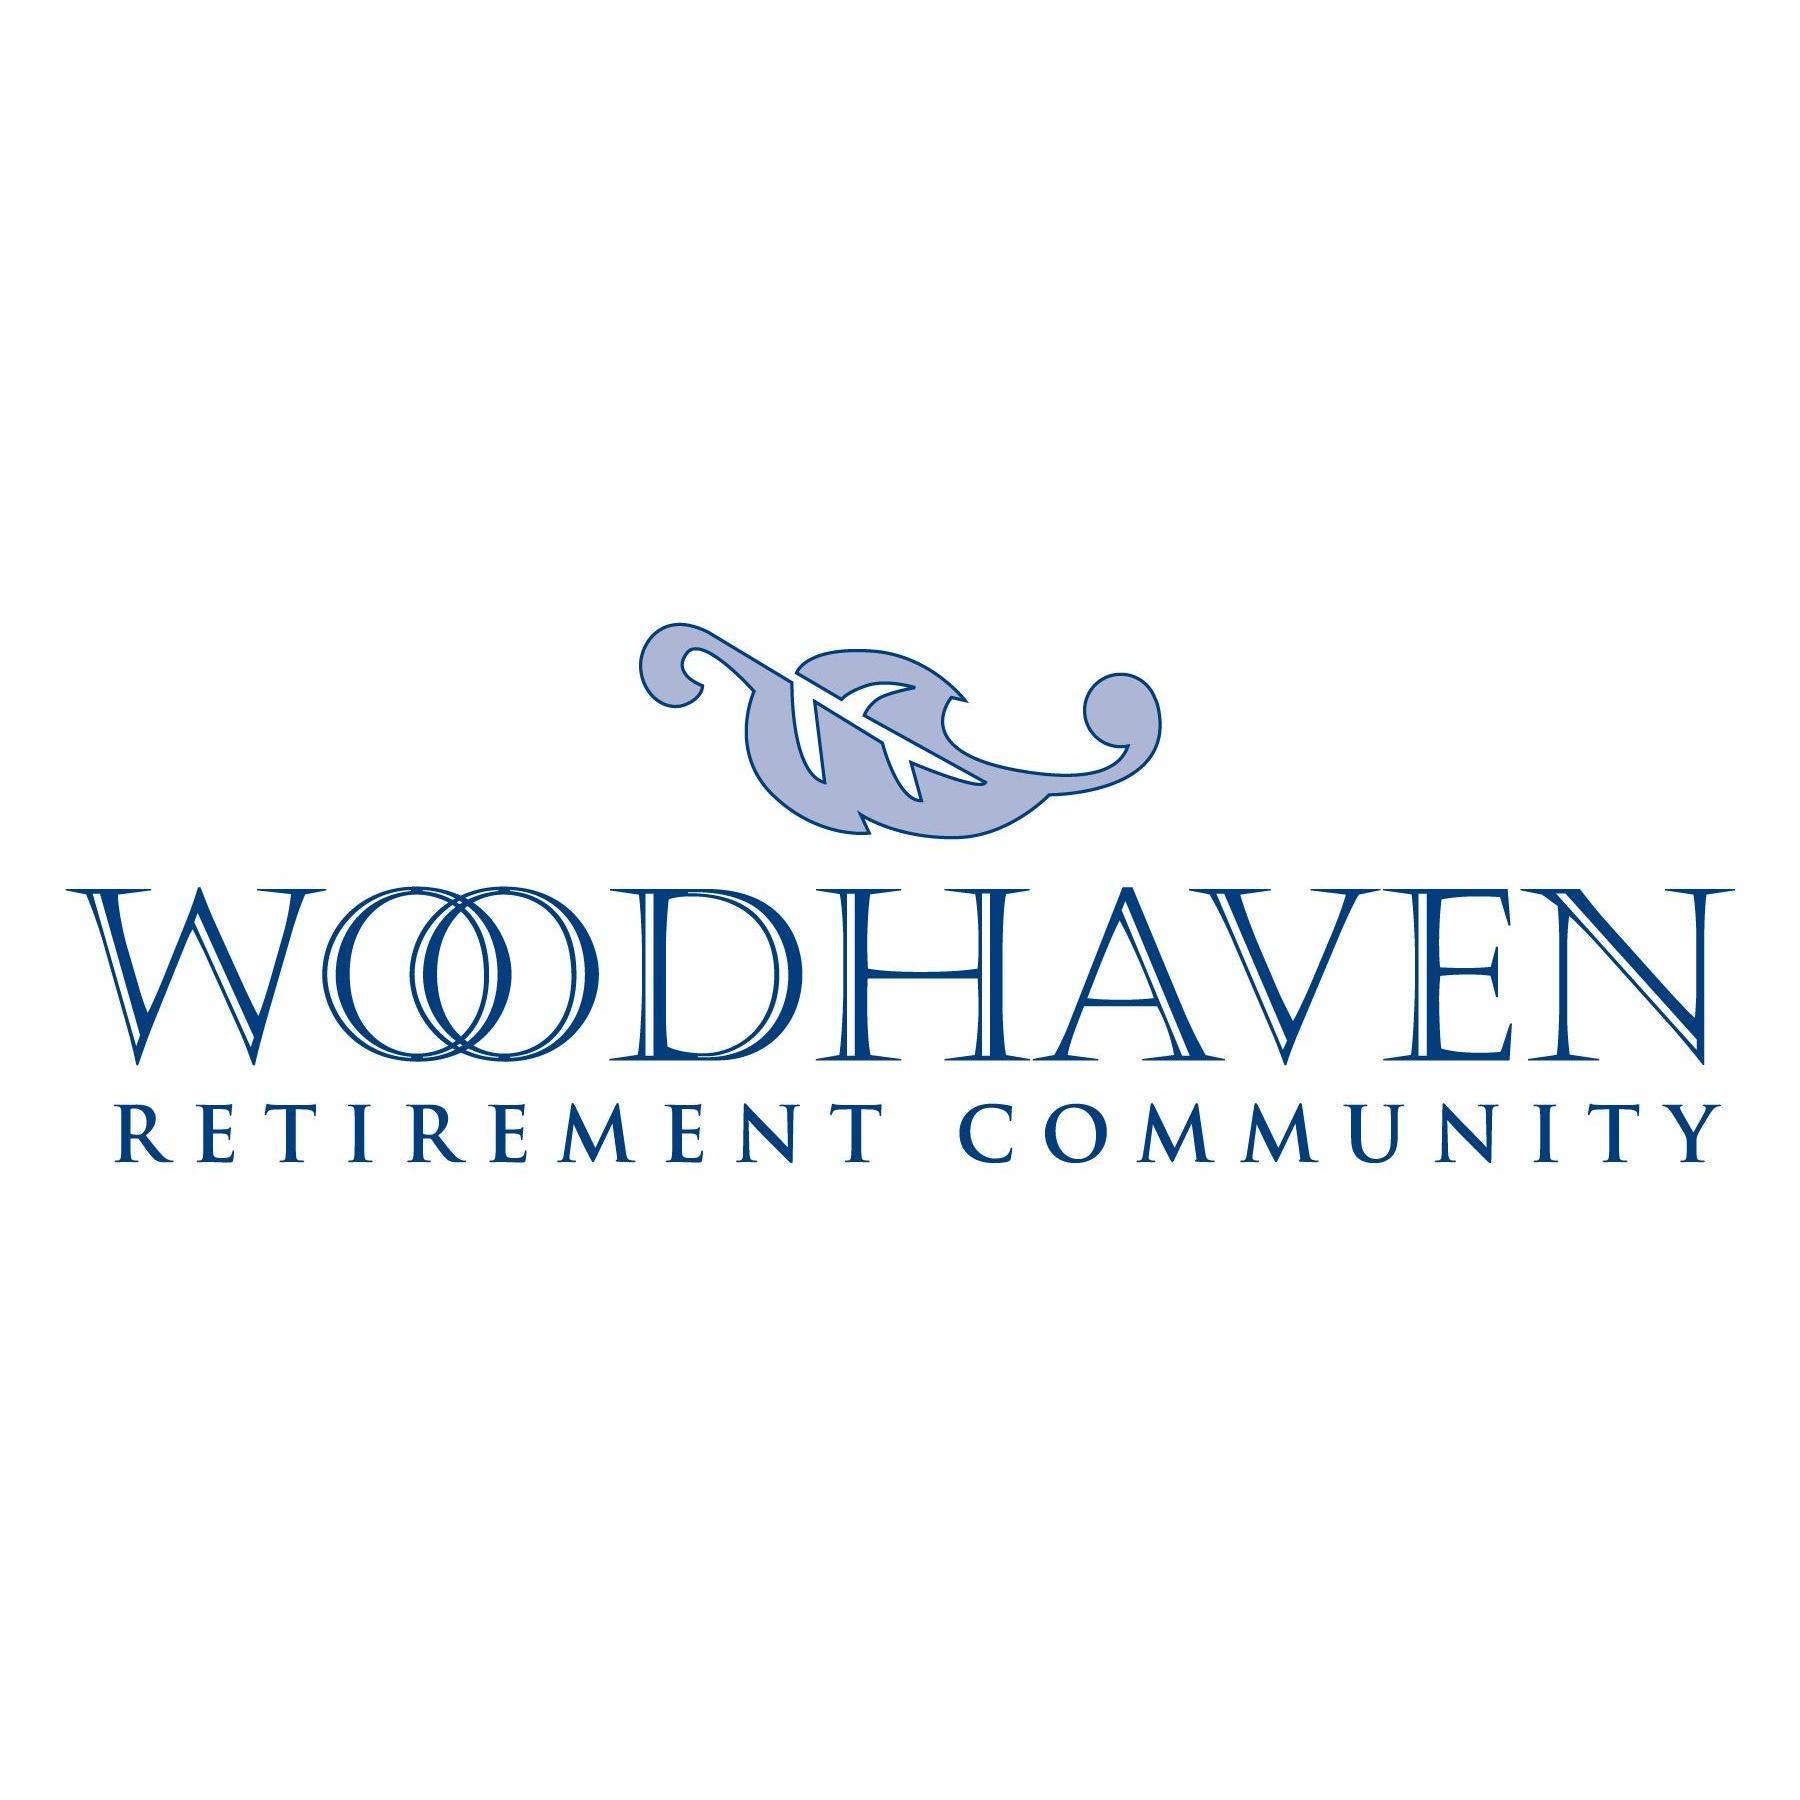 Woodhaven Retirement Community